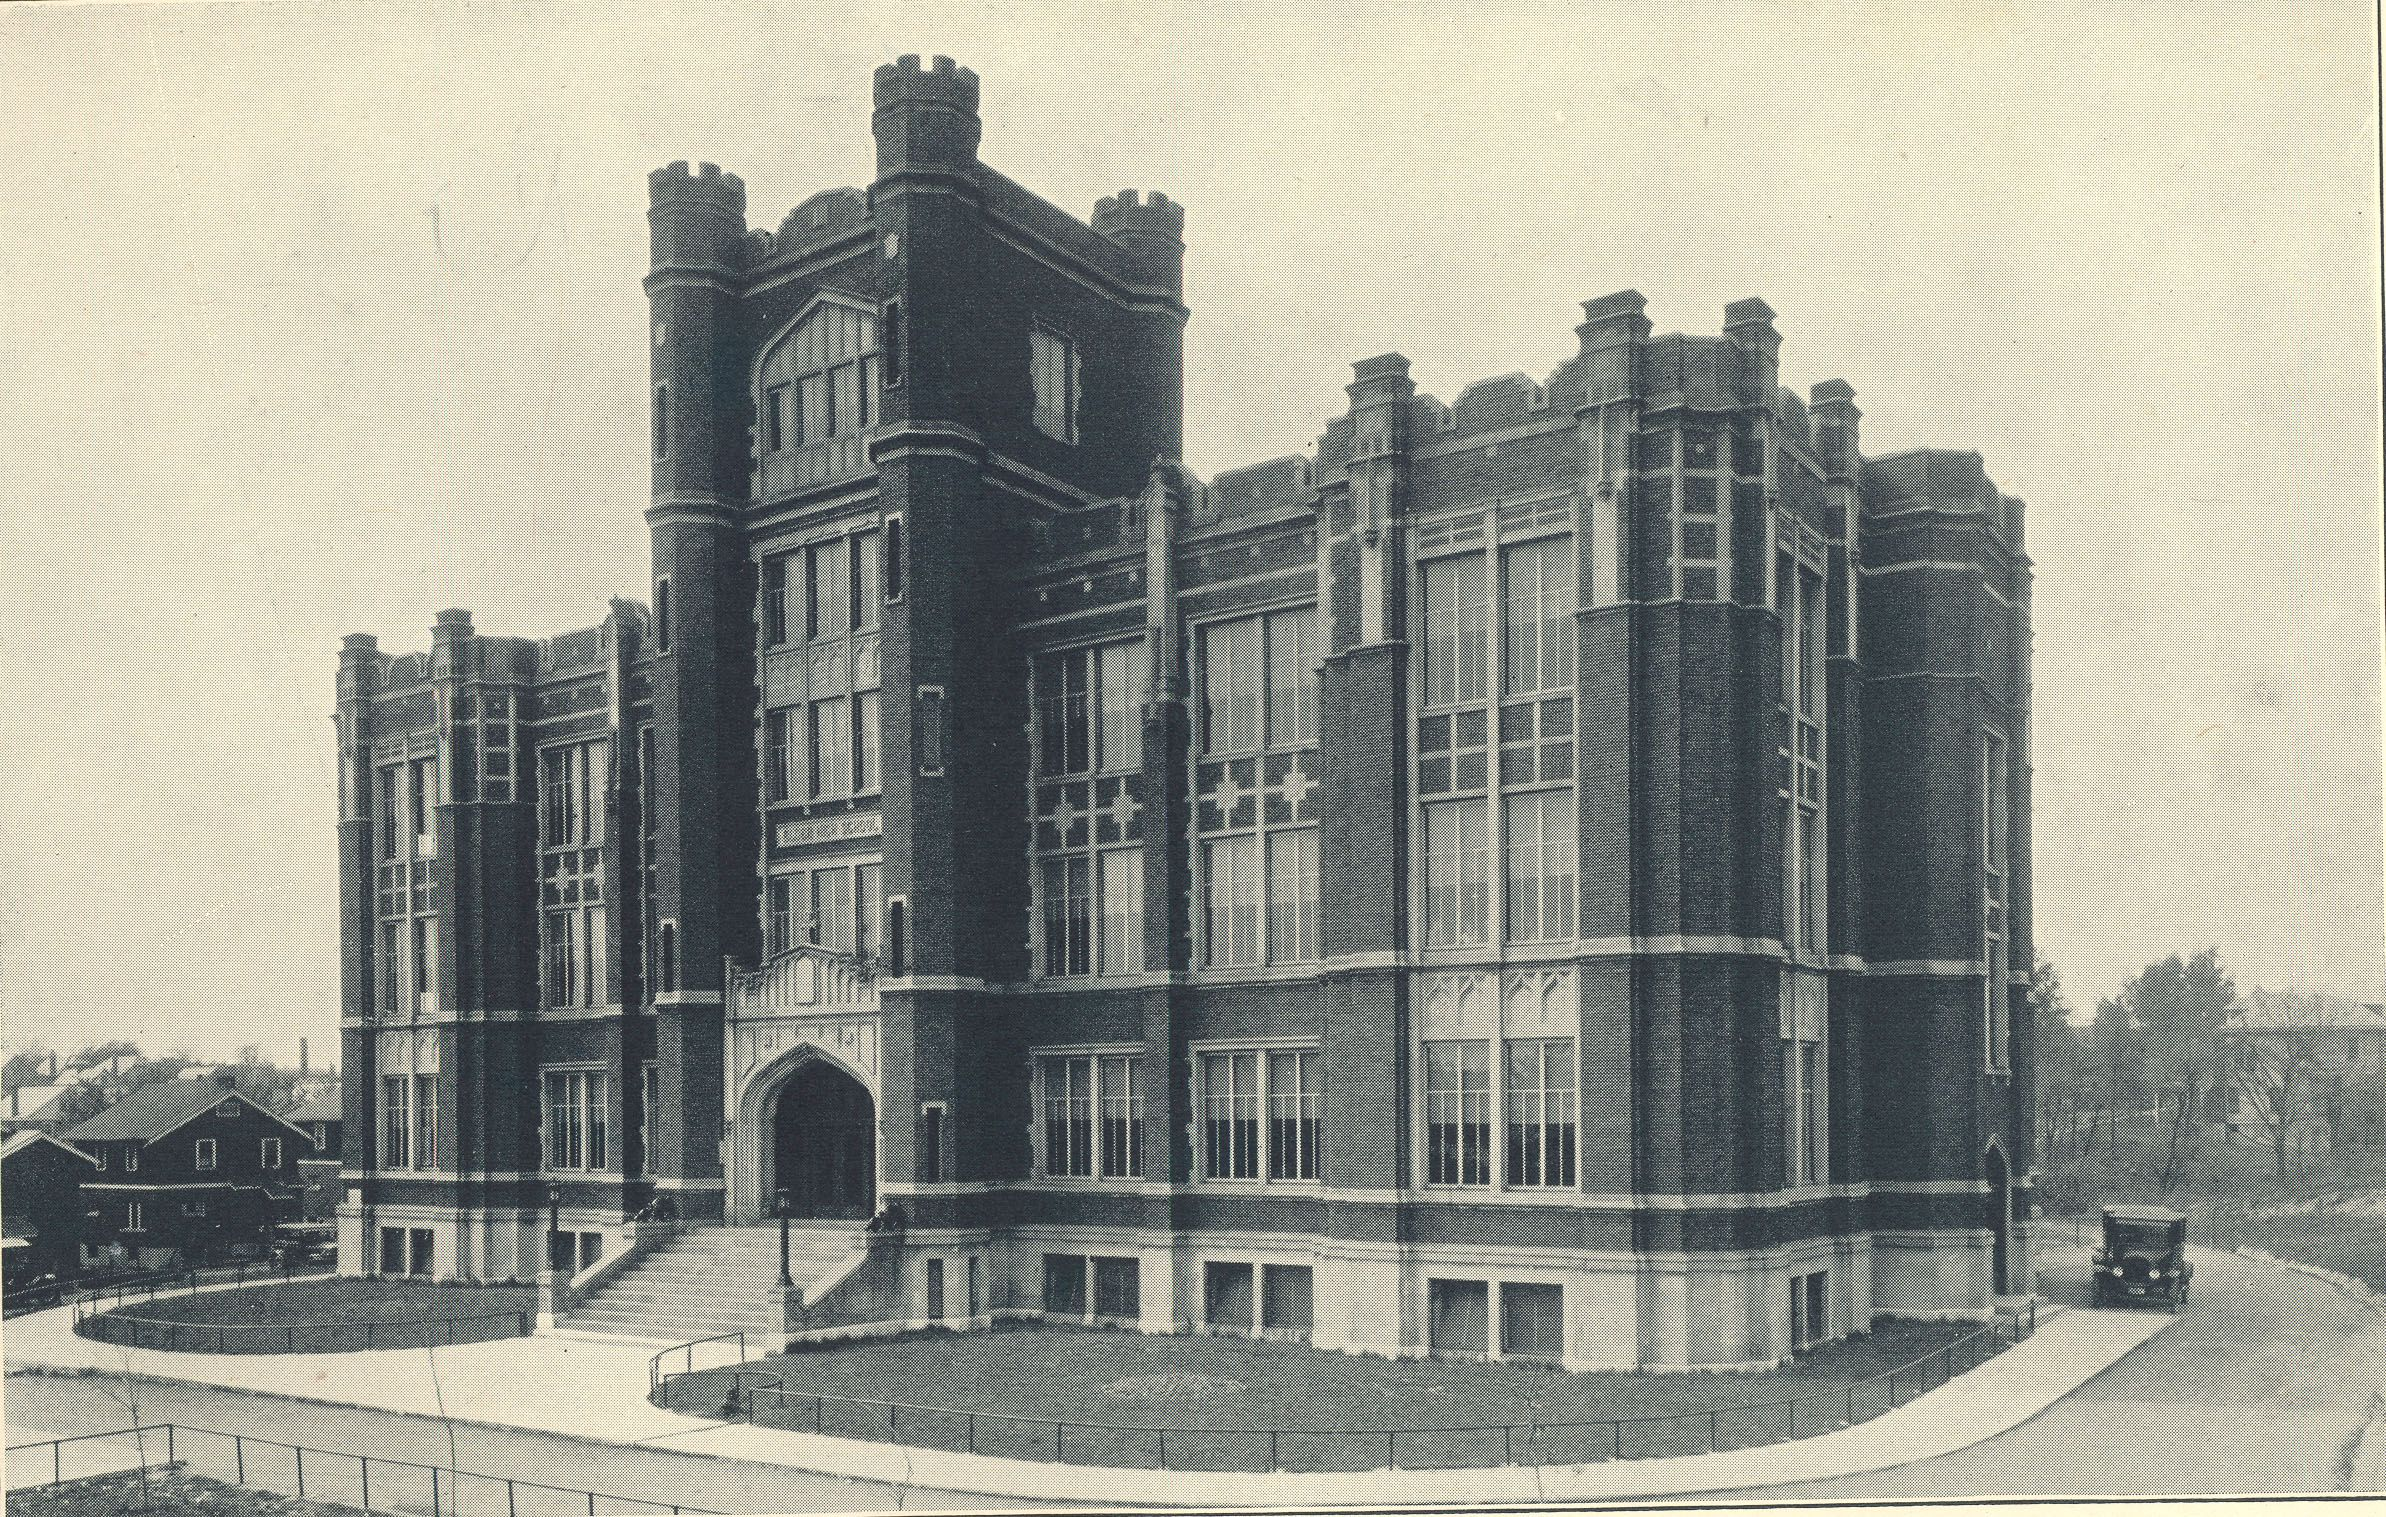 Elder High School 1922 Senior Pictures Downtown Cincinnati Ohio High School